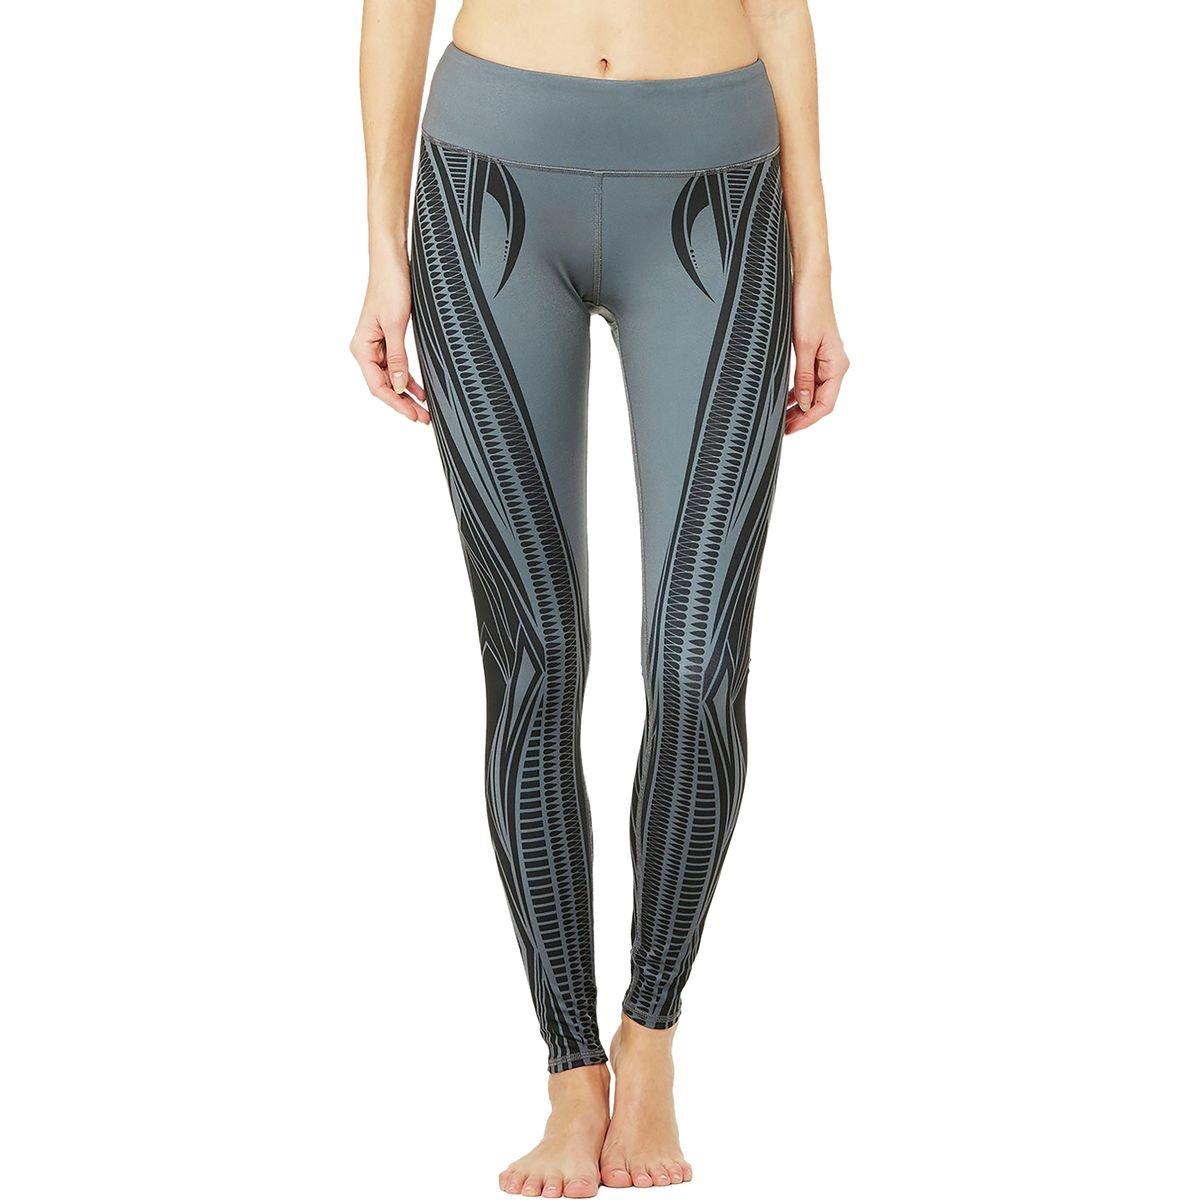 Alo Yoga Airbrush Legging - Women's Black Illusion, S